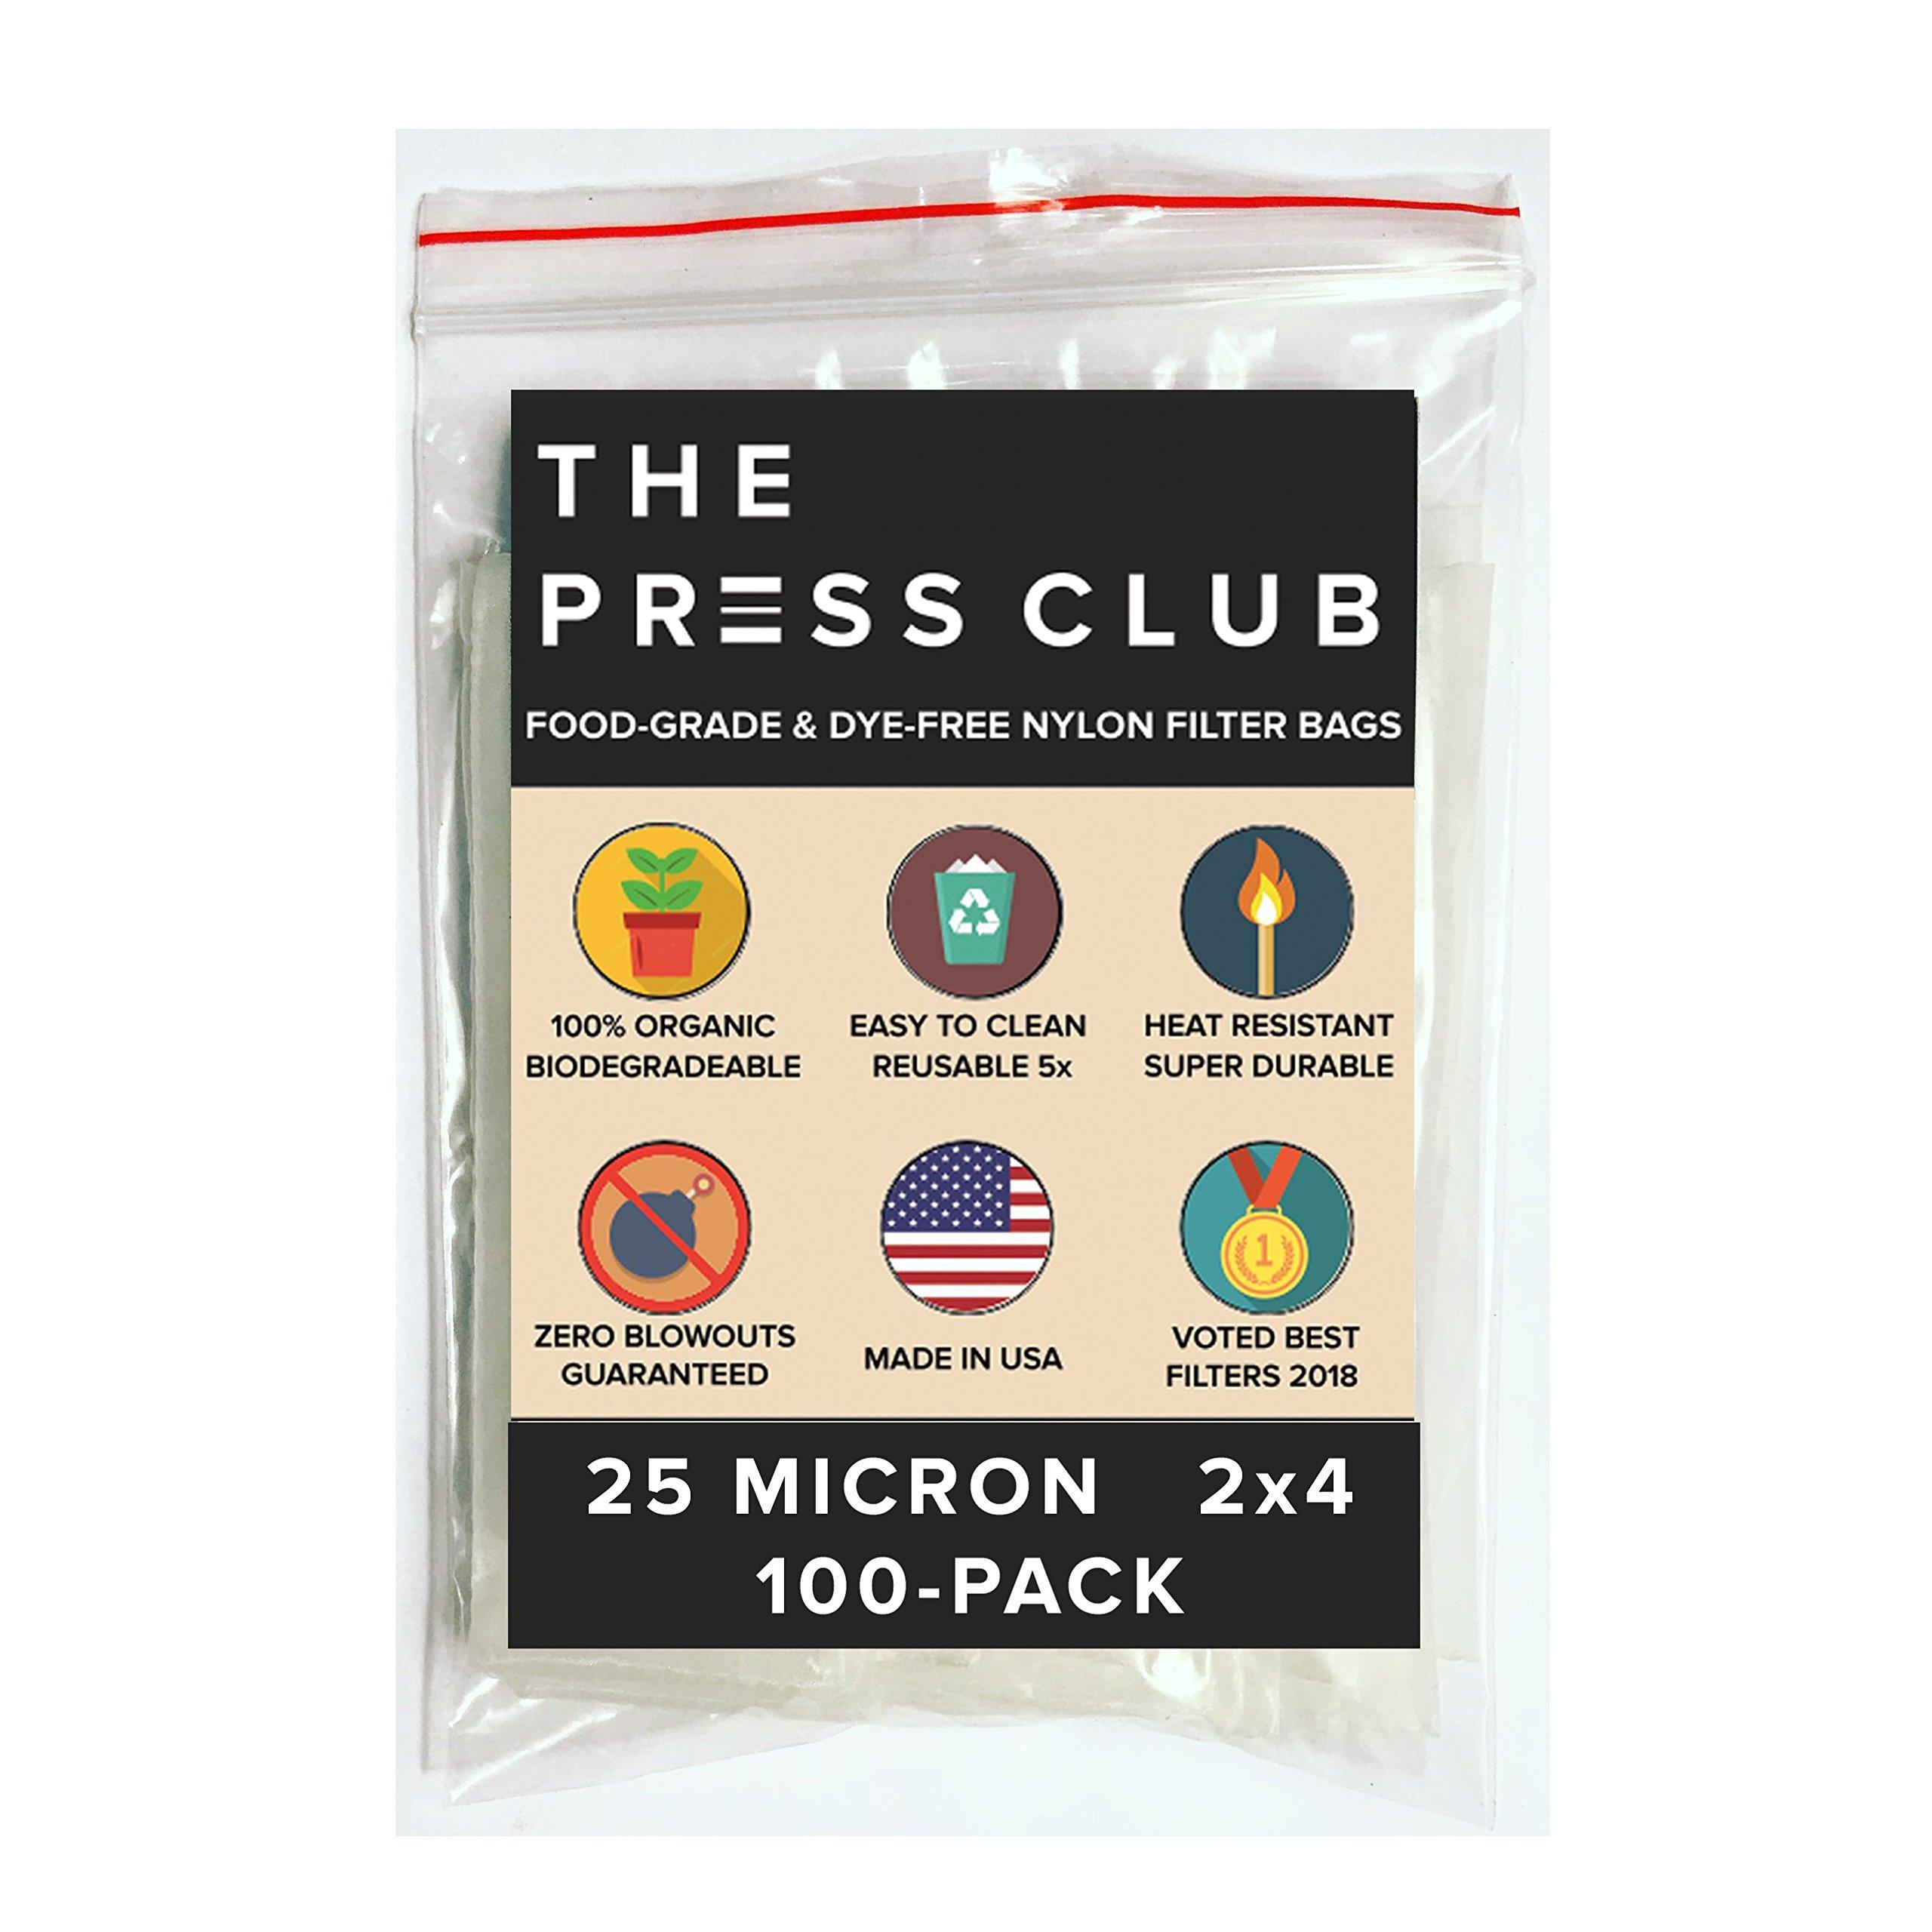 25 Micron | Premium Nylon Tea Filter Press Screen Bags | 2'' x 4'' | 100 Pack | Zero Blowout Guarantee | All Micron & Sizes Available